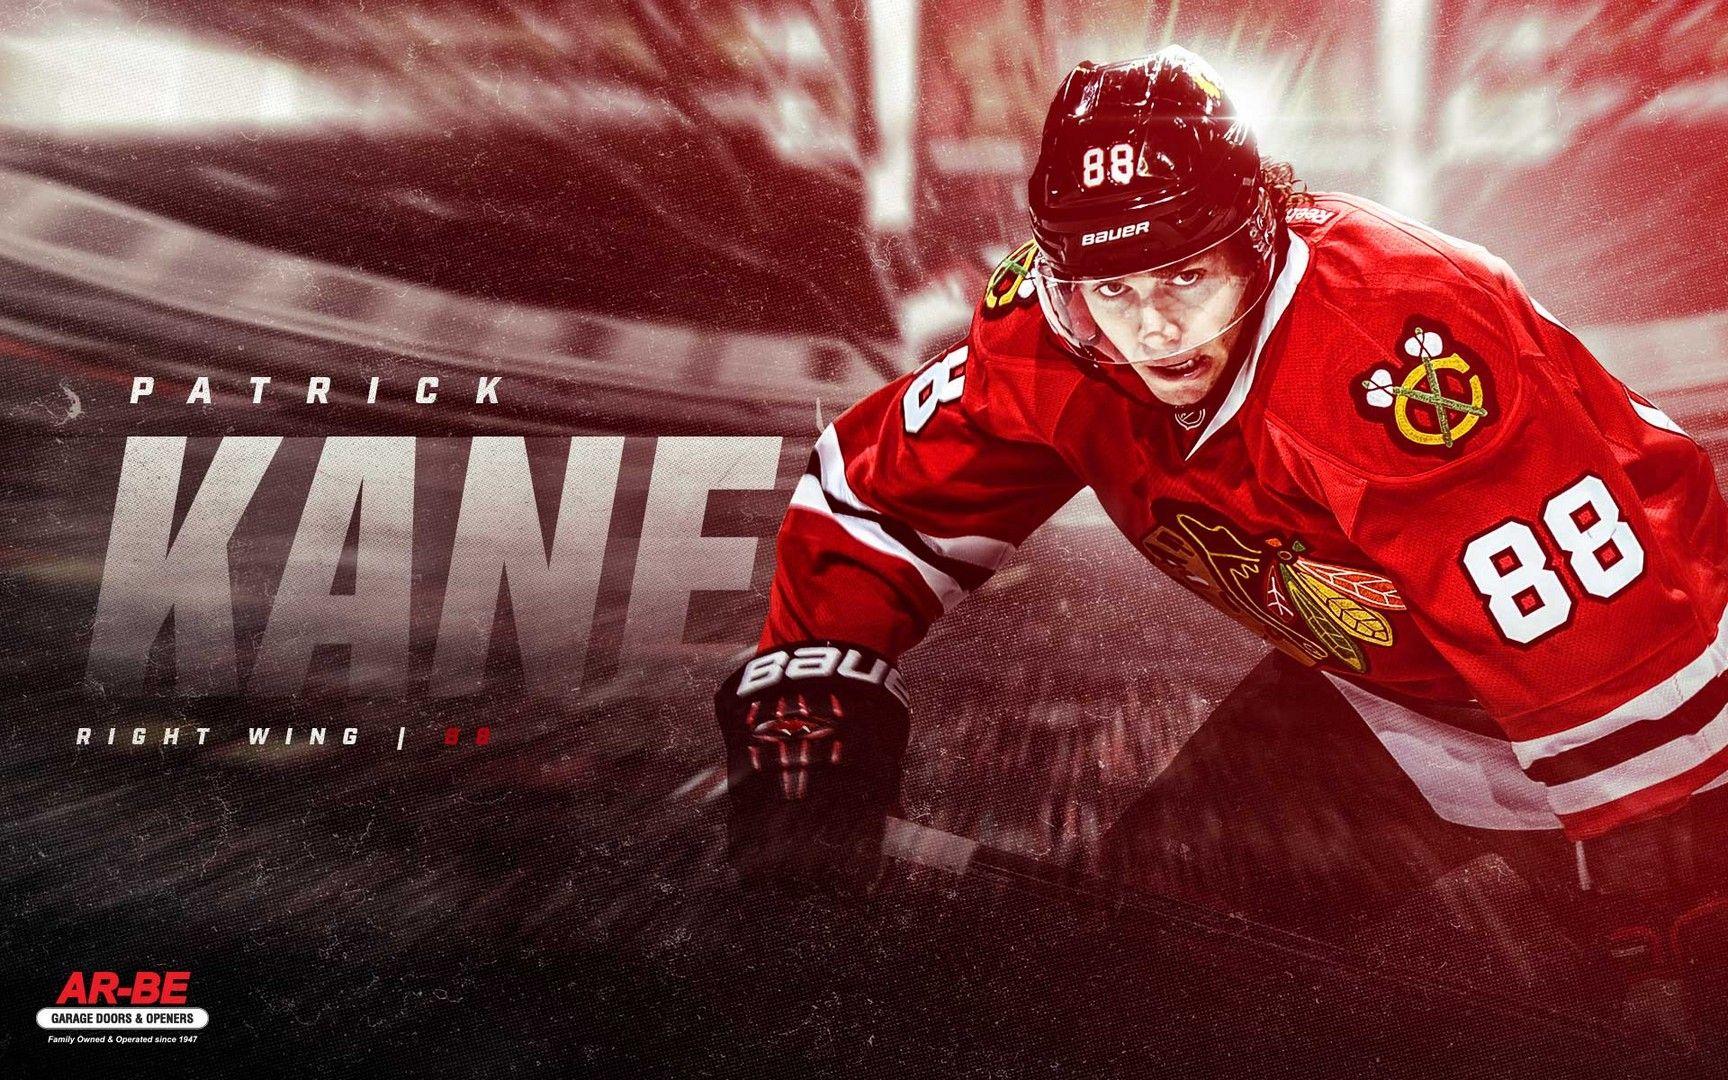 Blackhawks Kane Wallpaper 2020 Live Wallpaper Hd Chicago Blackhawks Wallpaper Chicago Blackhawks Blackhawks